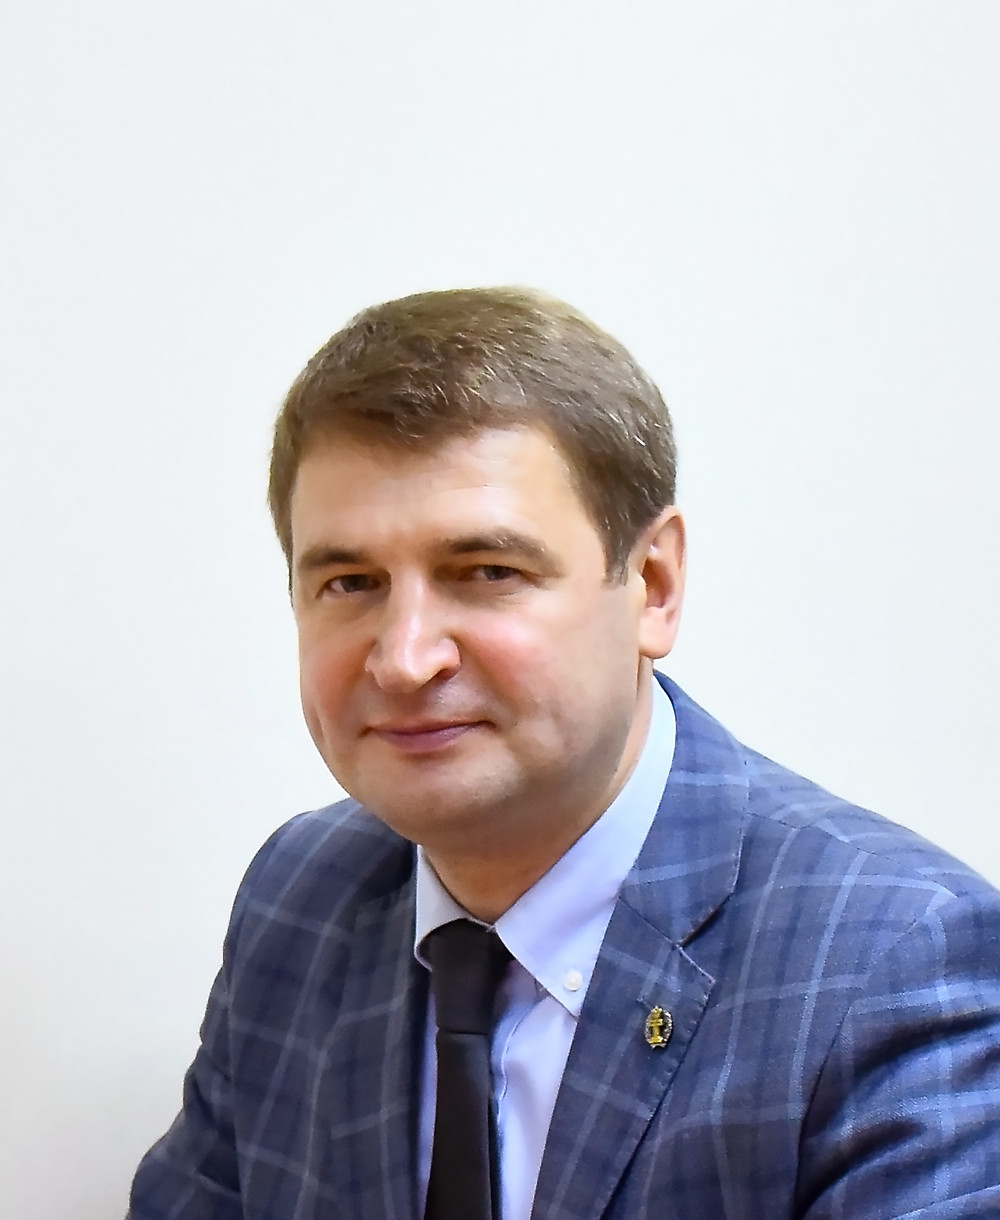 Адвокат Дмитрий Загайнов